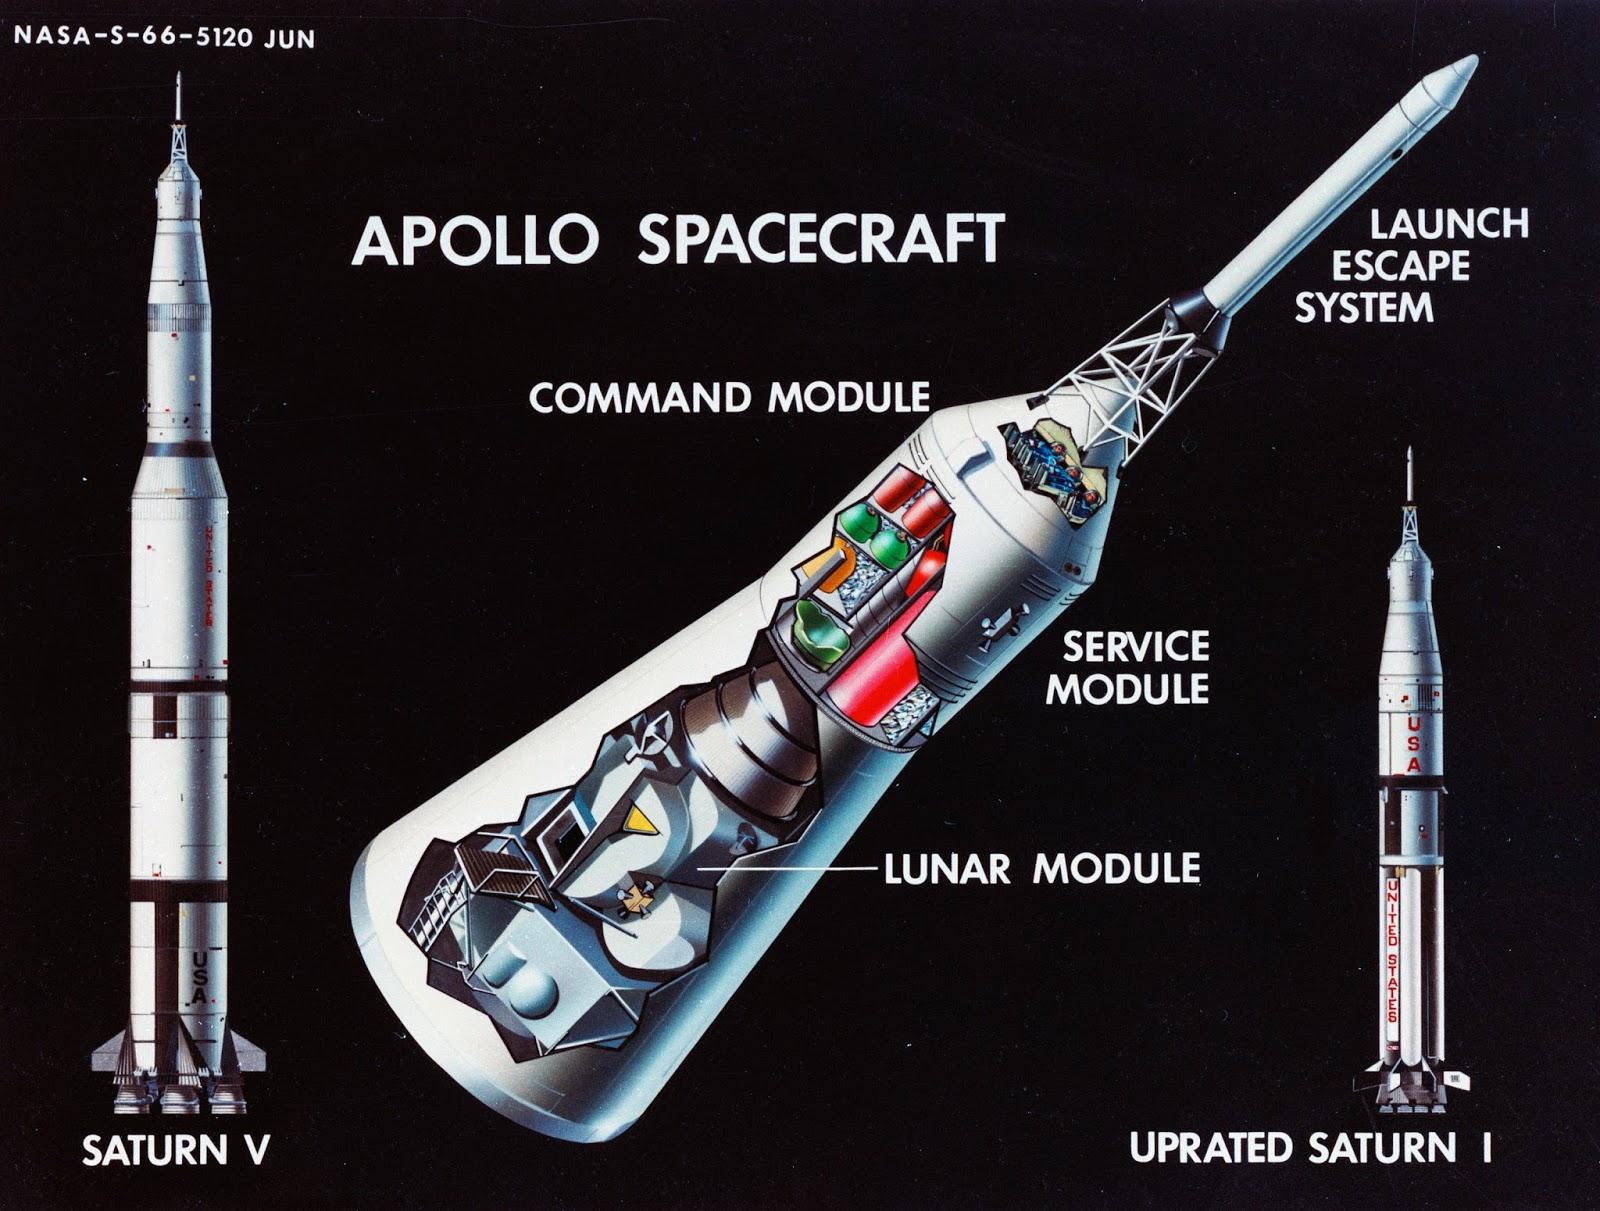 apollo spacecraft guidance system - photo #34